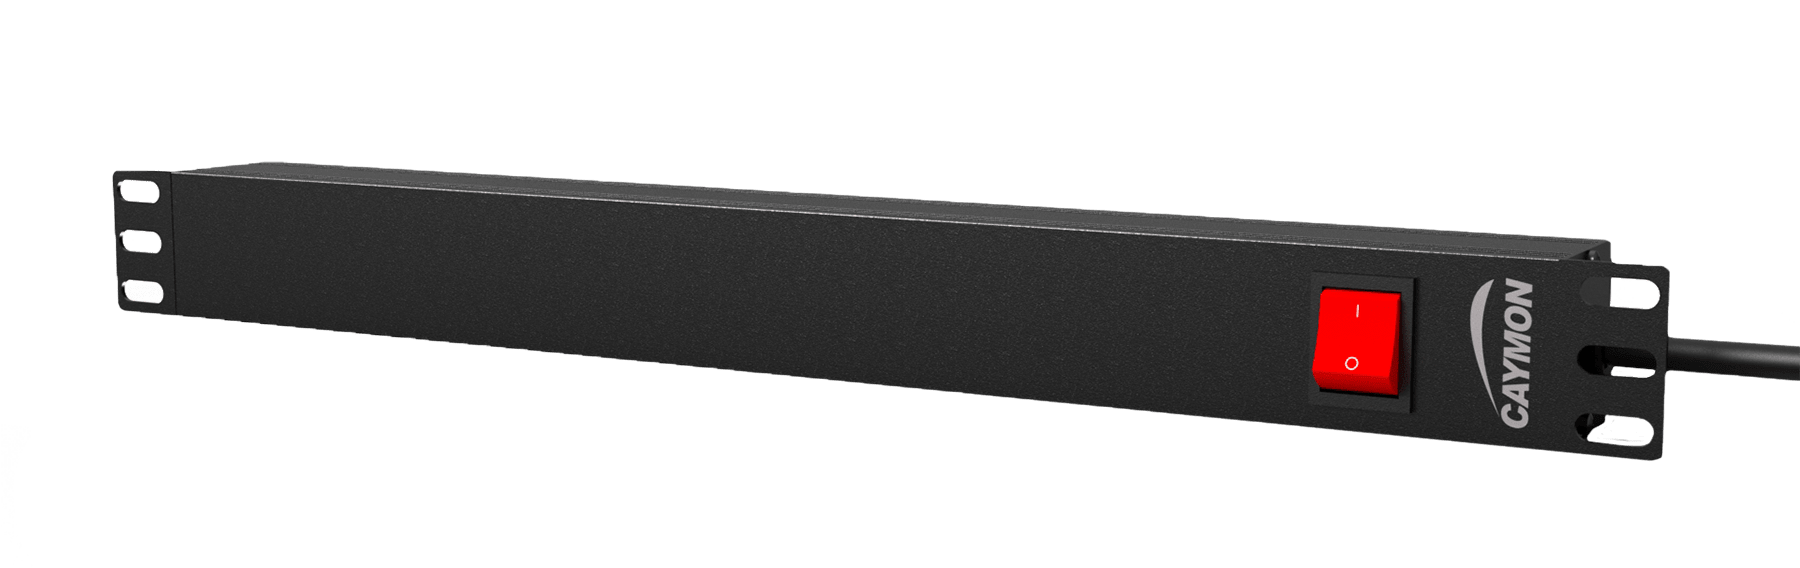 "PSR118FS - 19"" power distribution unit - 8x French socket + rear switch"